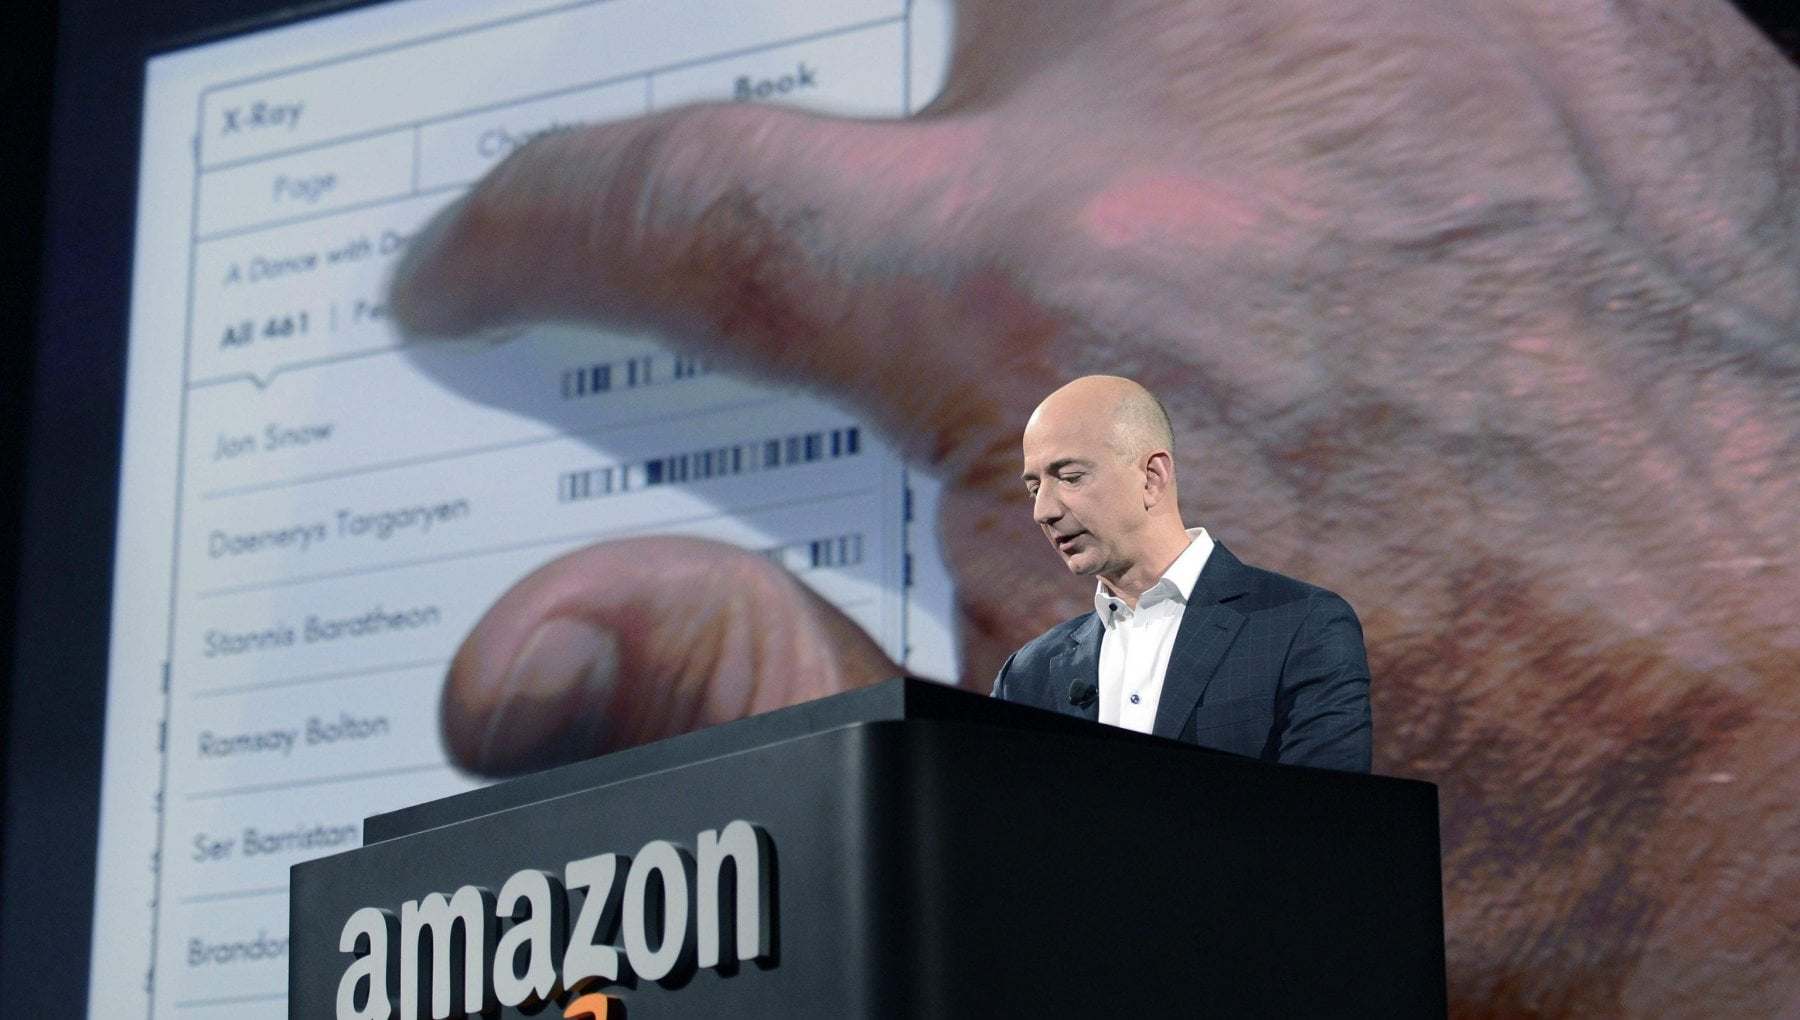 223403432 3b7a9e33 e538 439d 830d 7d6c76398199 - Amazon, Jeff Bezos lascerà il 5 luglio: al suo posto Andy Jassy